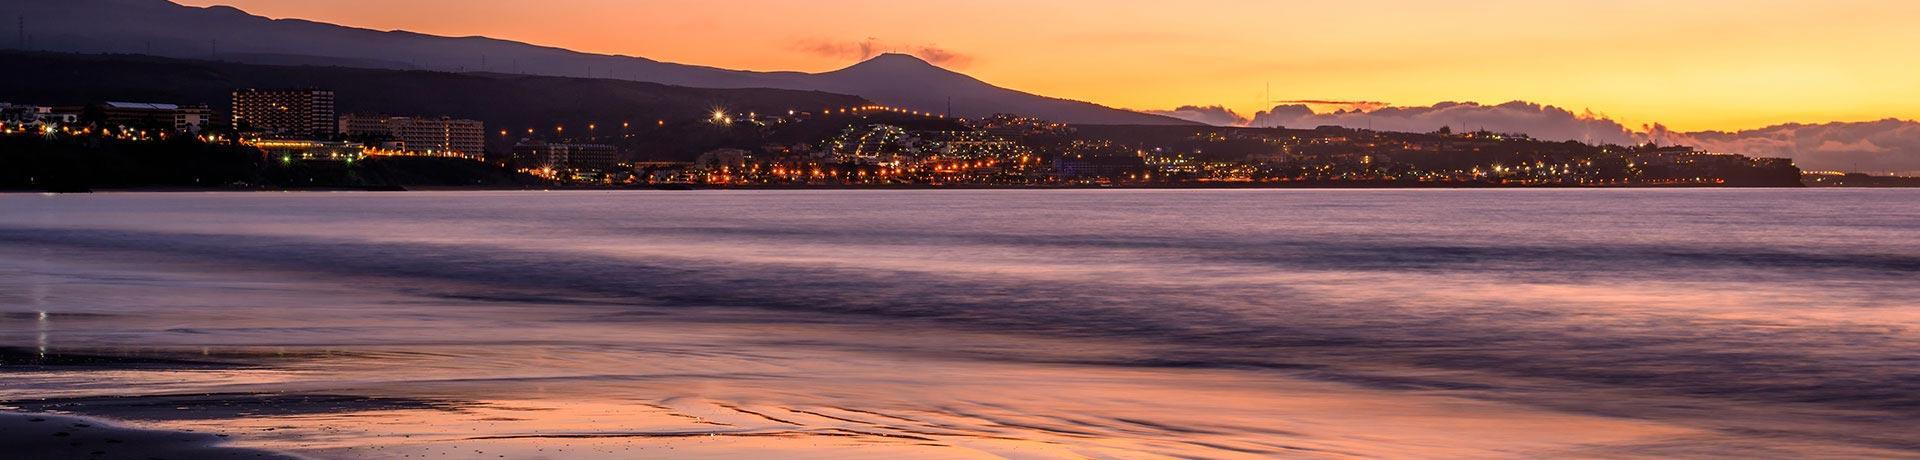 city-id-262-spanien-gran-canaria-playa-del-ingles.jpg